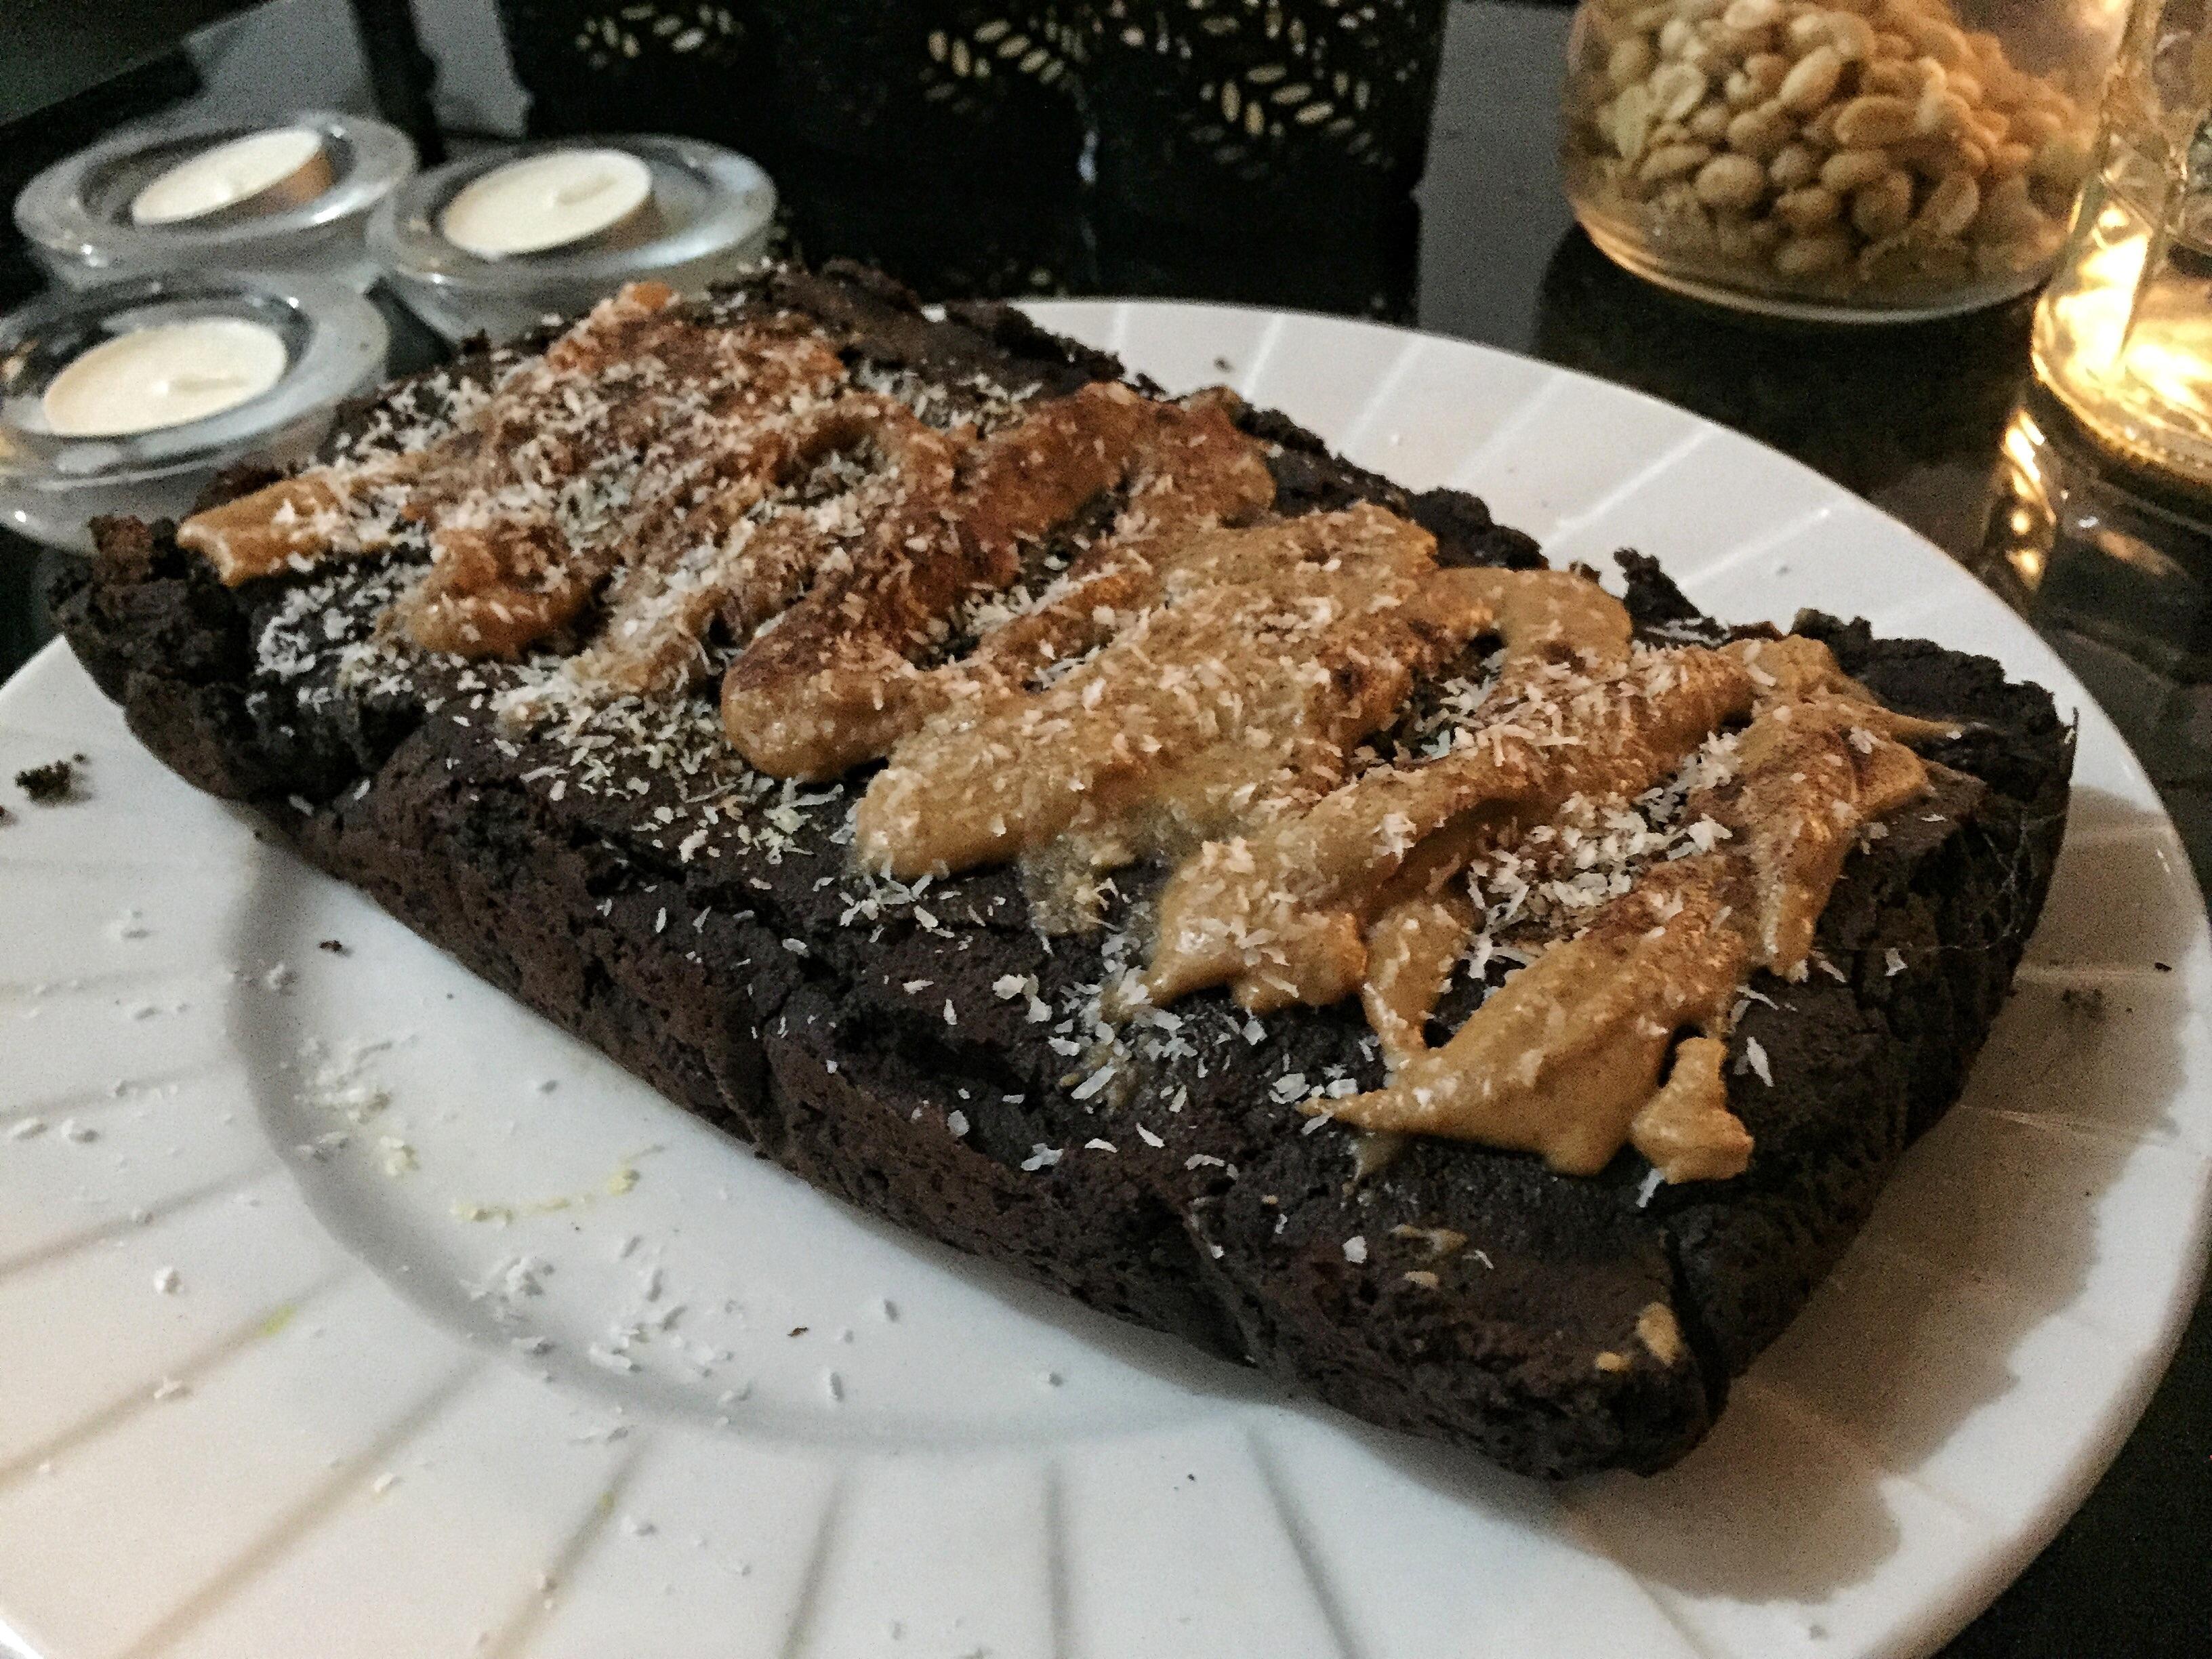 Keto Cake Dessert Idea